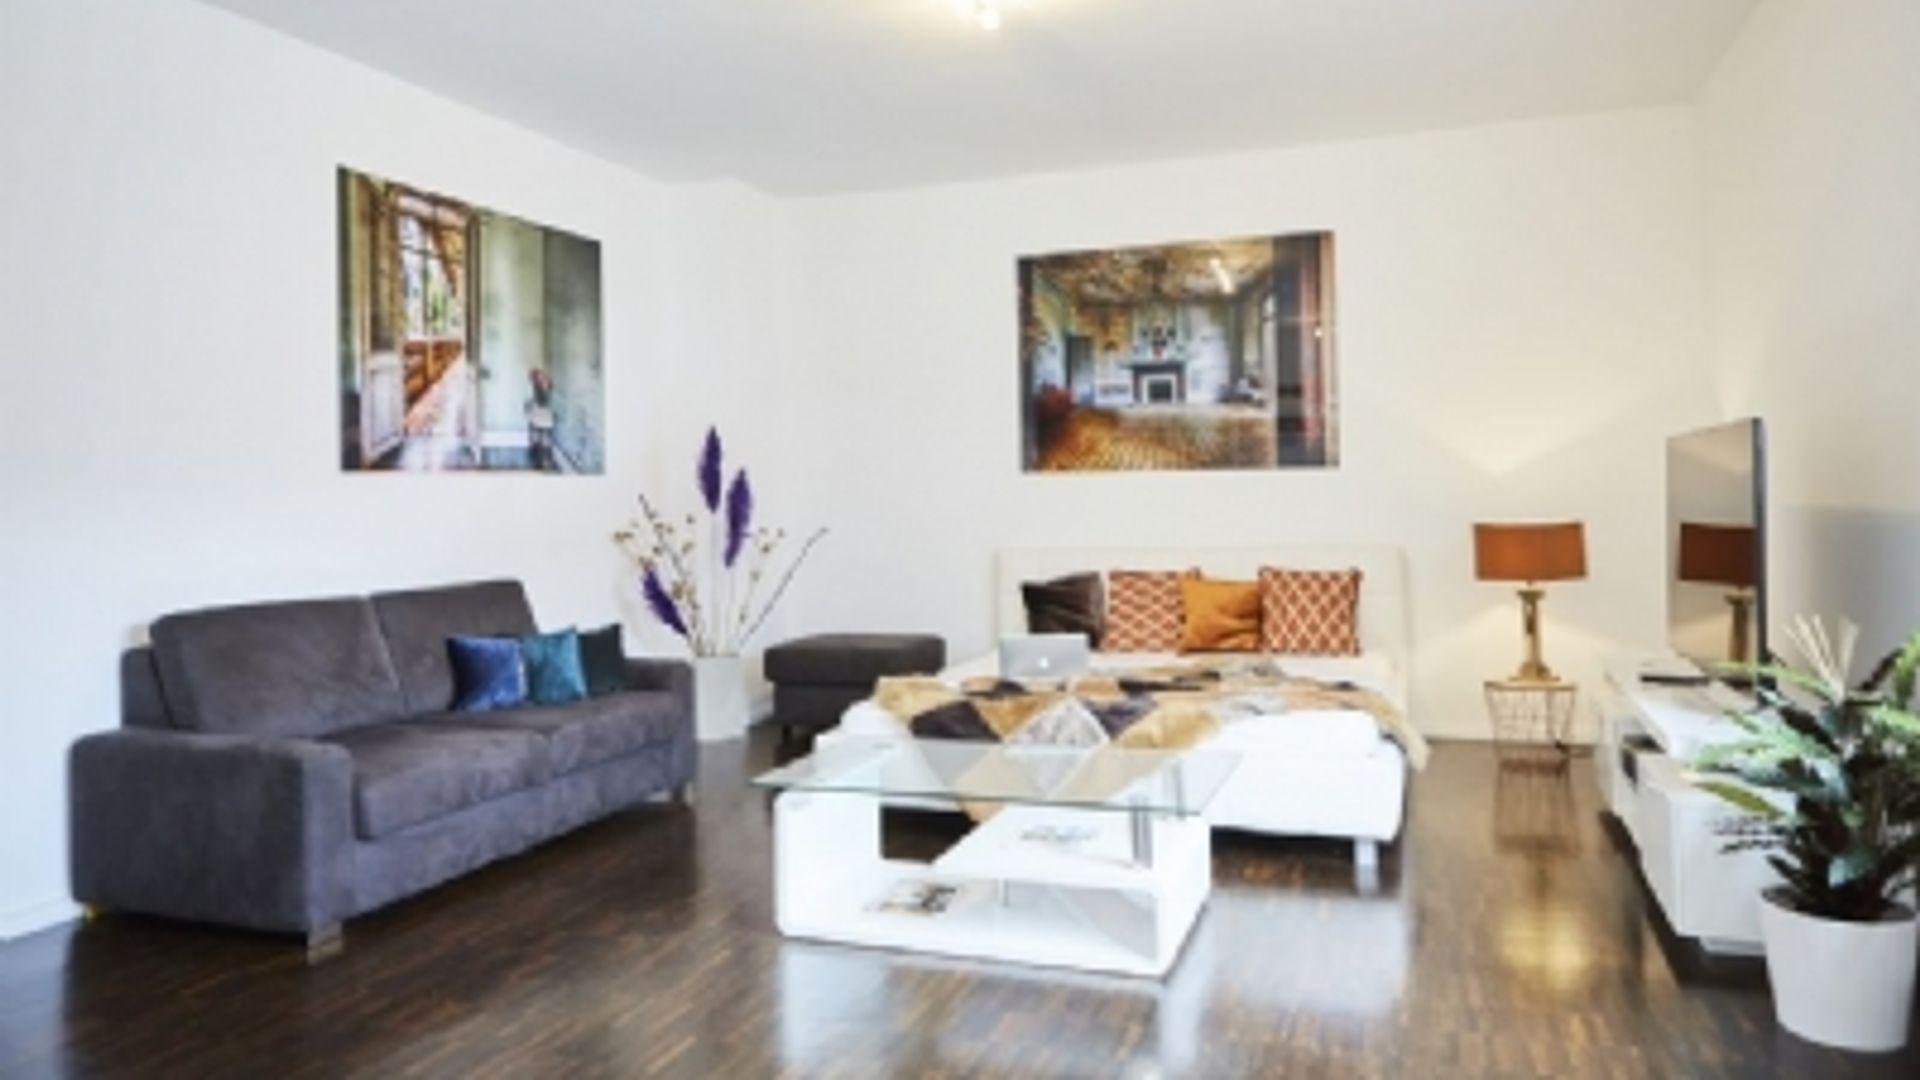 1 Bedroom Apartment At Wilhelm Varnholt Allee 1 68165 Mannheim Germany 6425948 Rentberry